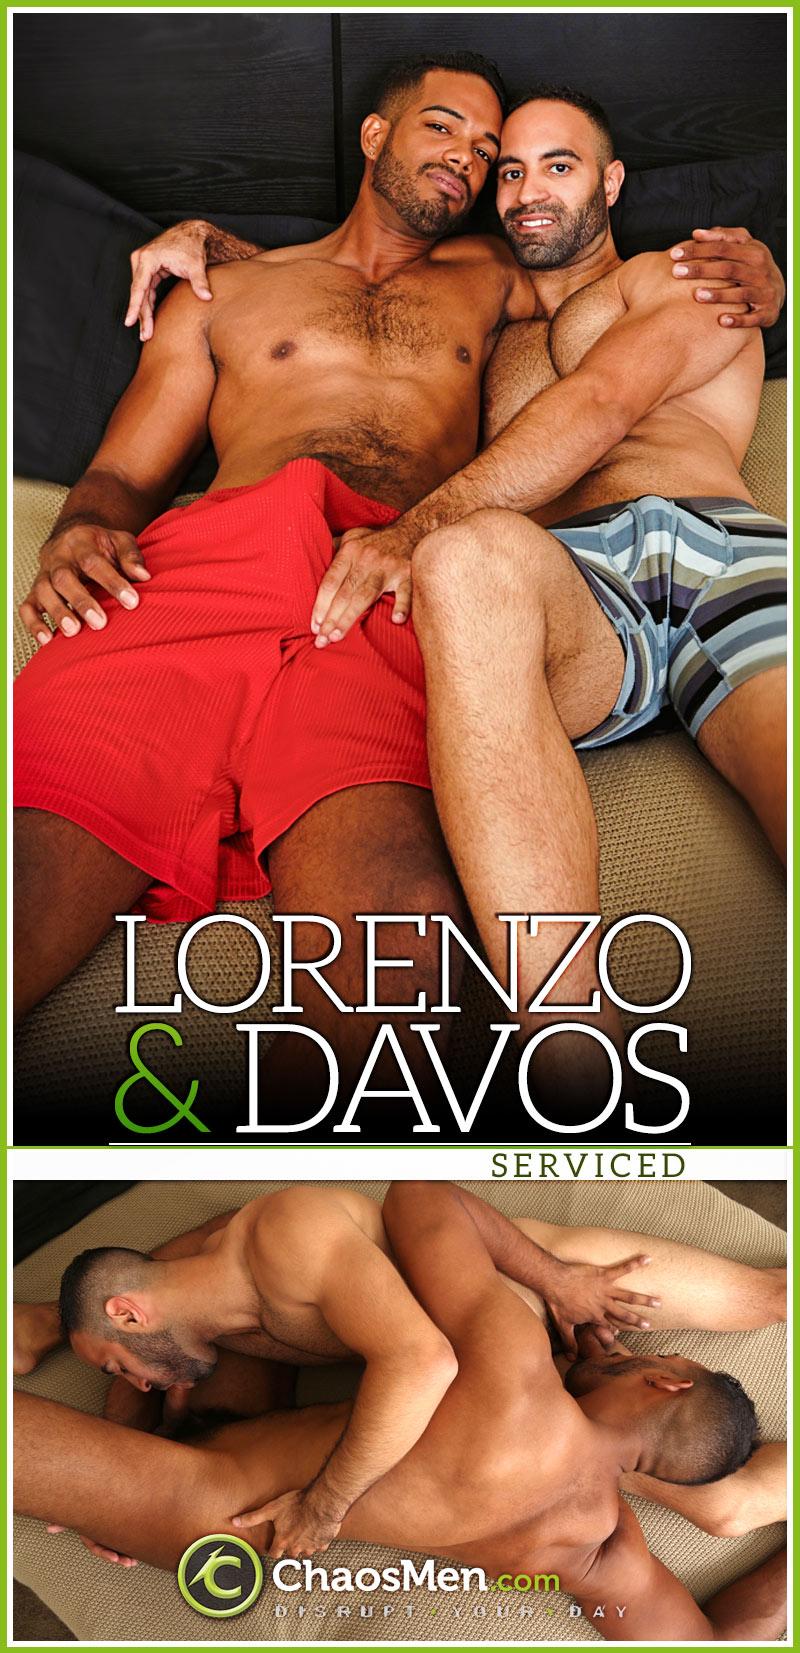 Davos & Lorenzo (Serviced) at ChaosMen